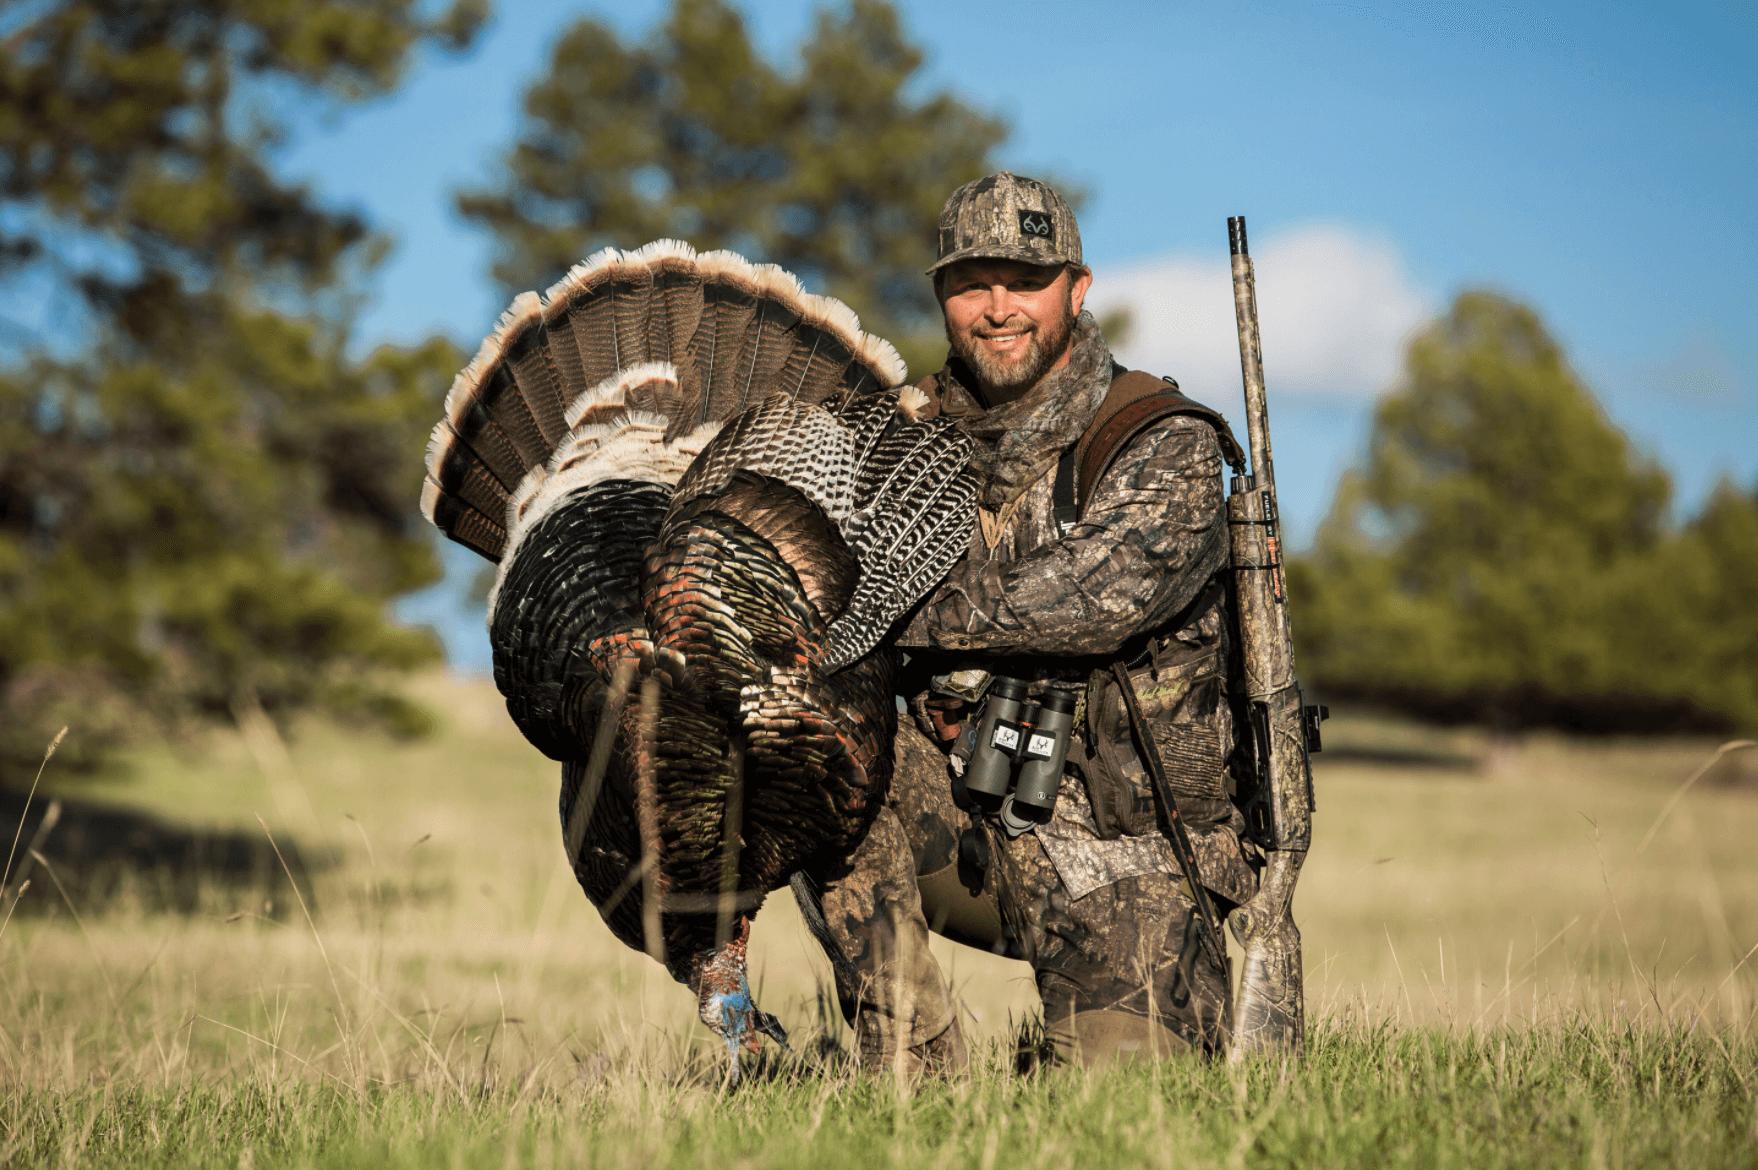 Turkey Hunting Insight from Michael Waddell